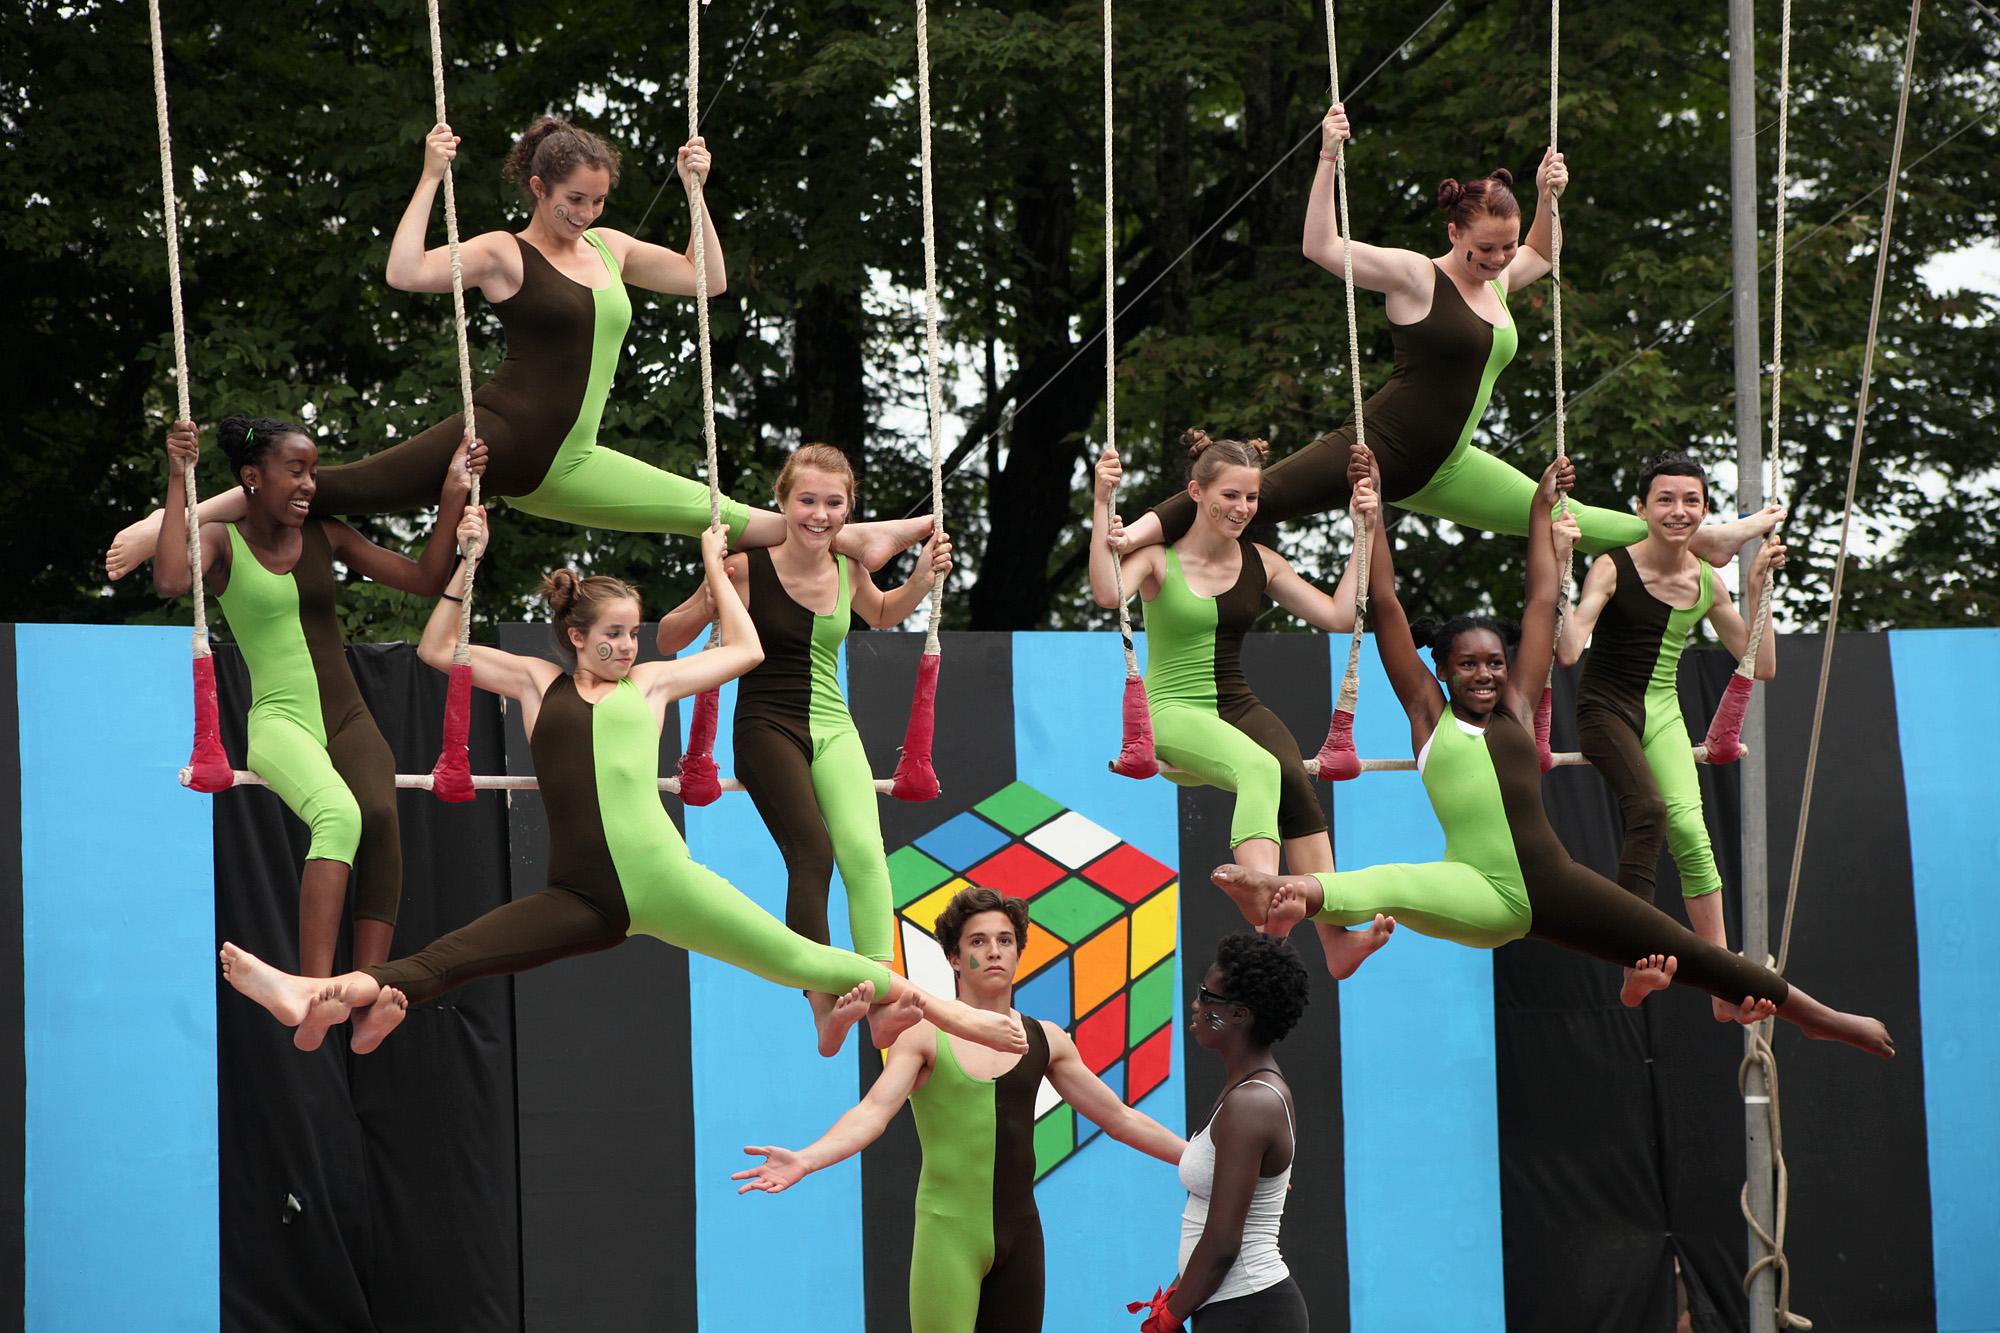 Circus Camp Long Lake 3 Ring Flying Circus Camps A